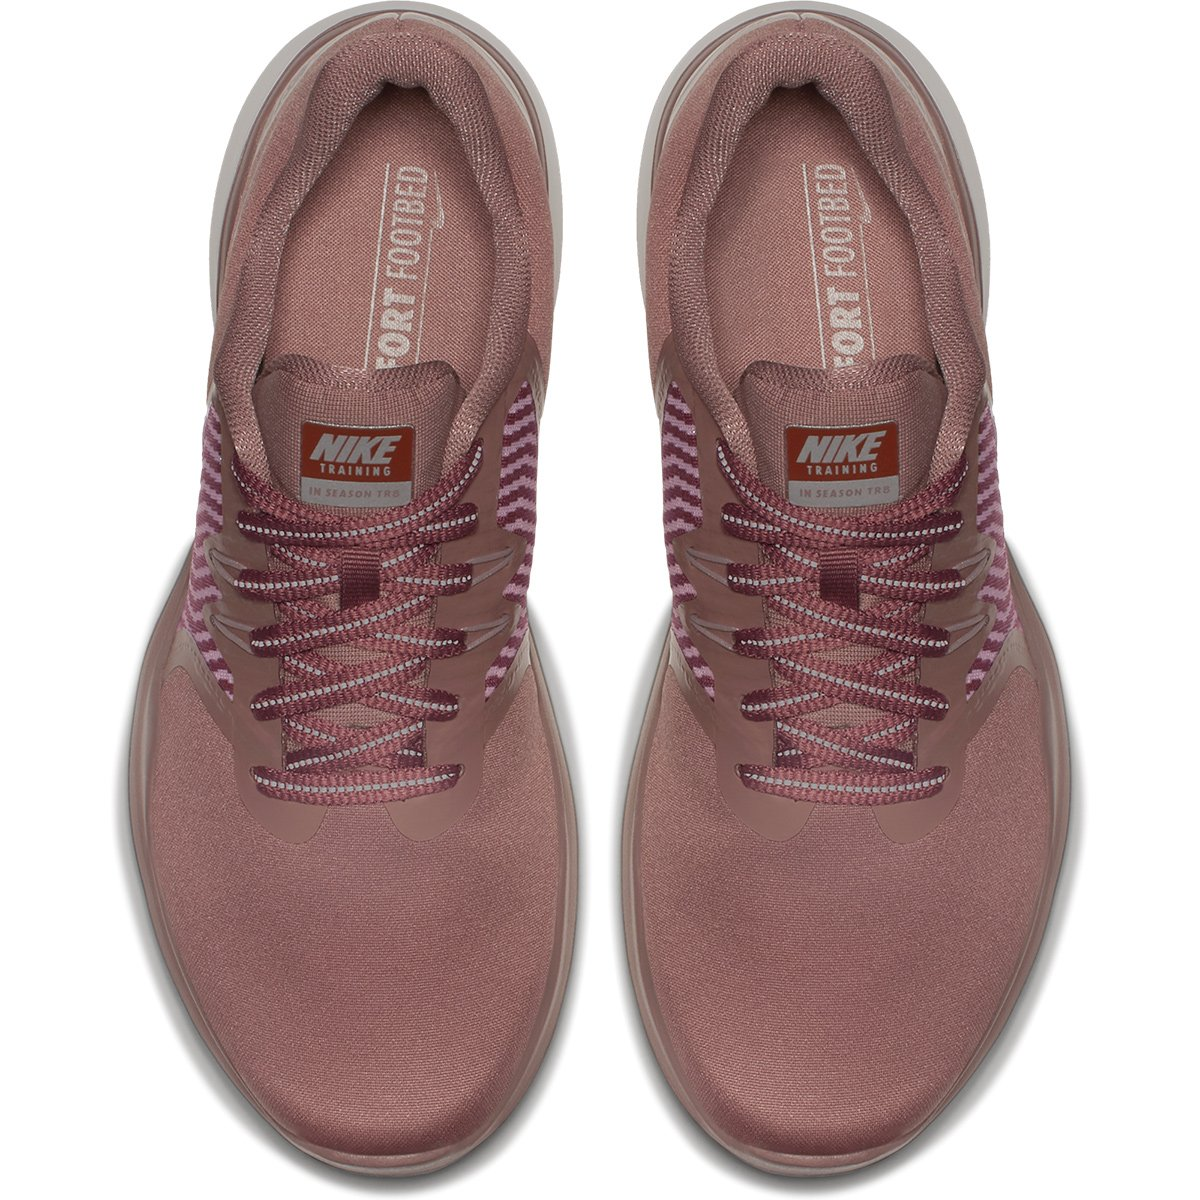 6e1b77b507 Tênis Nike In-Season Tr 8 Prm Feminino - Roxo - Compre Agora